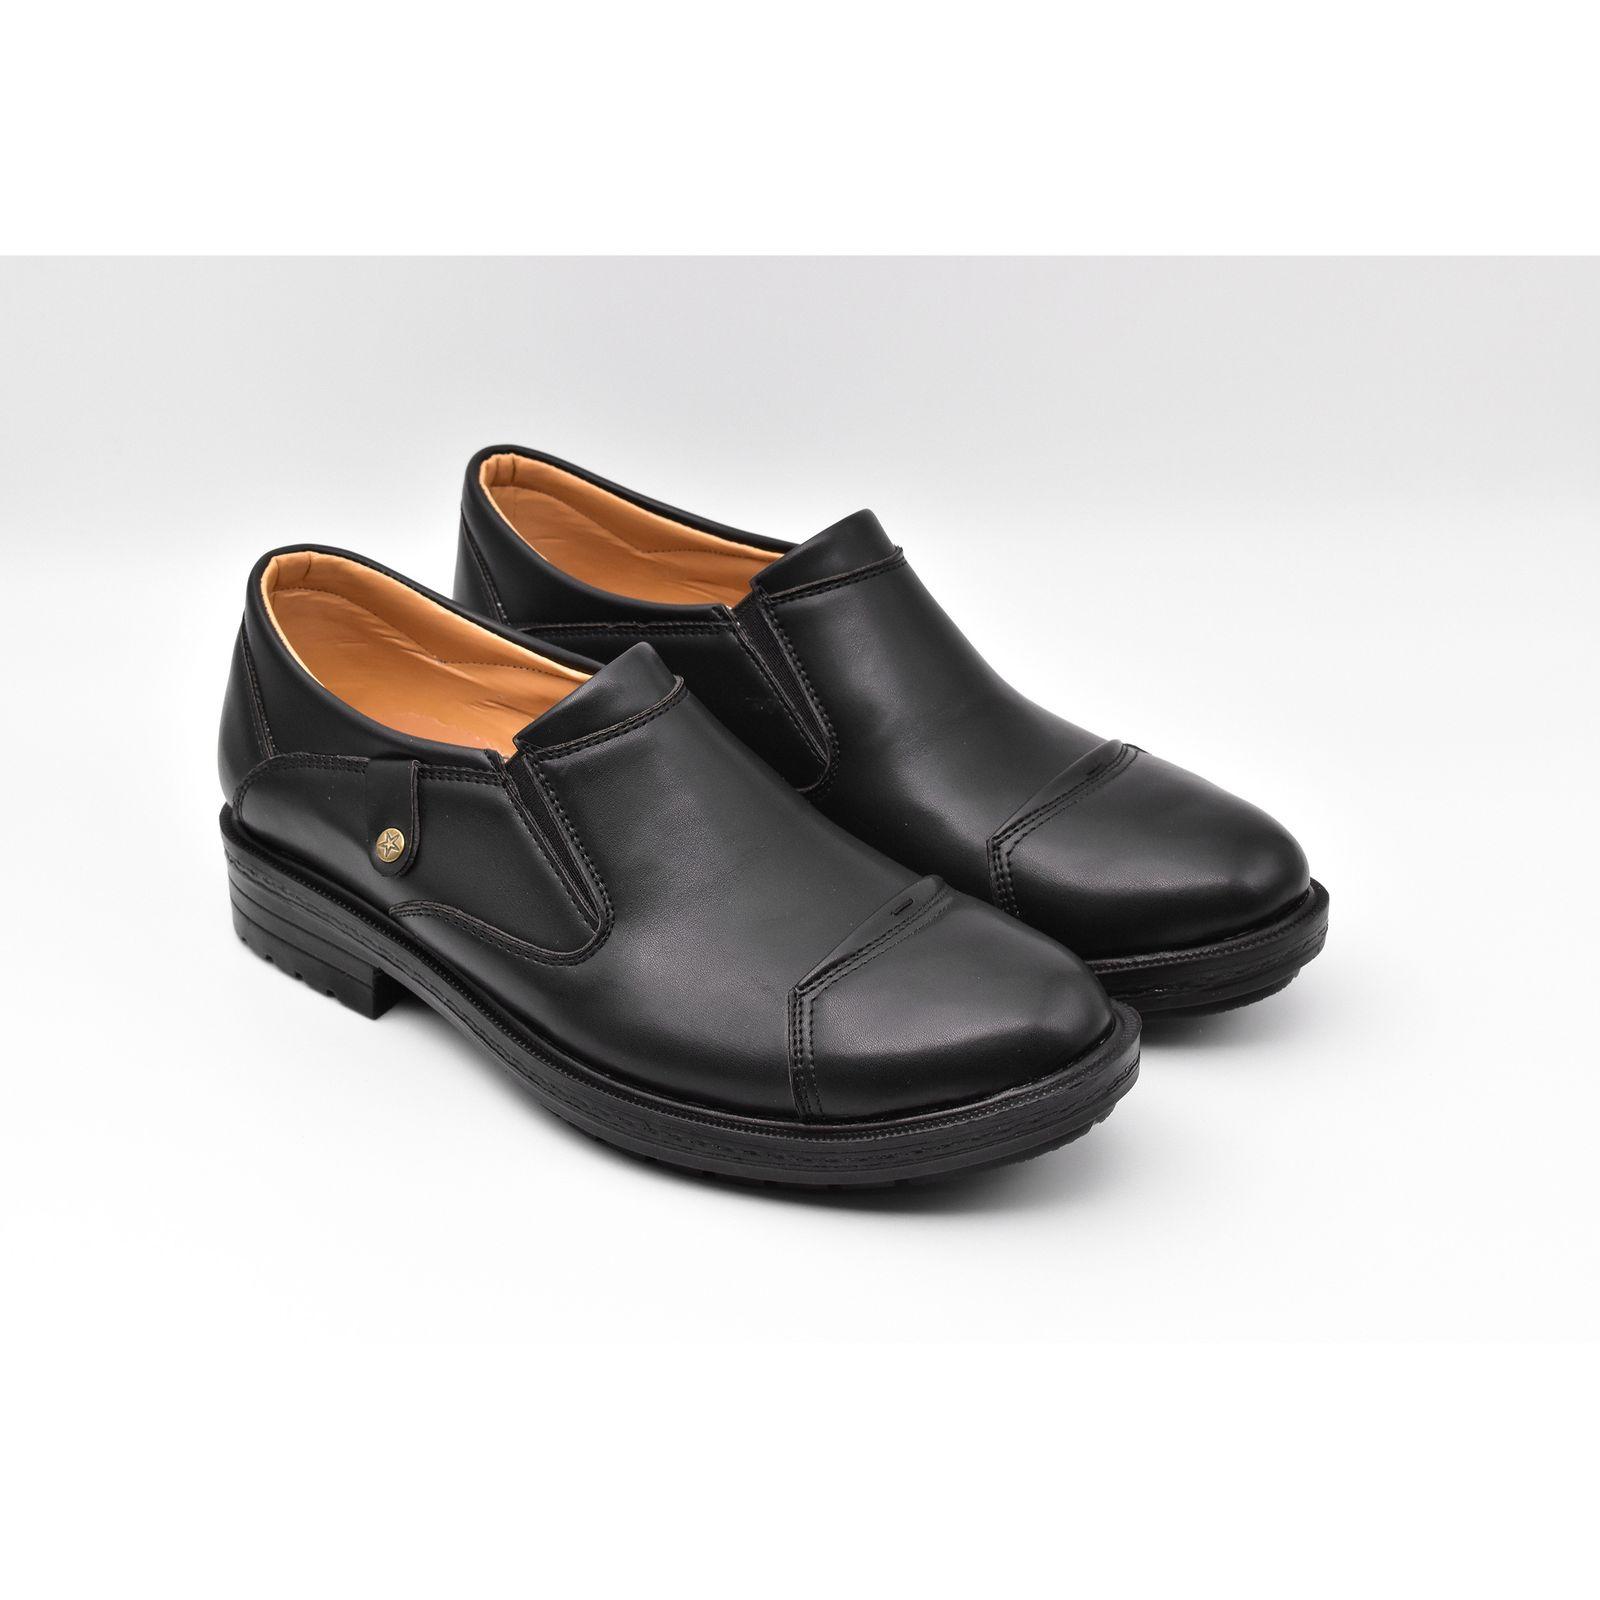 کفش مردانه سینگل مدل سهیل کد 6510 -  - 4